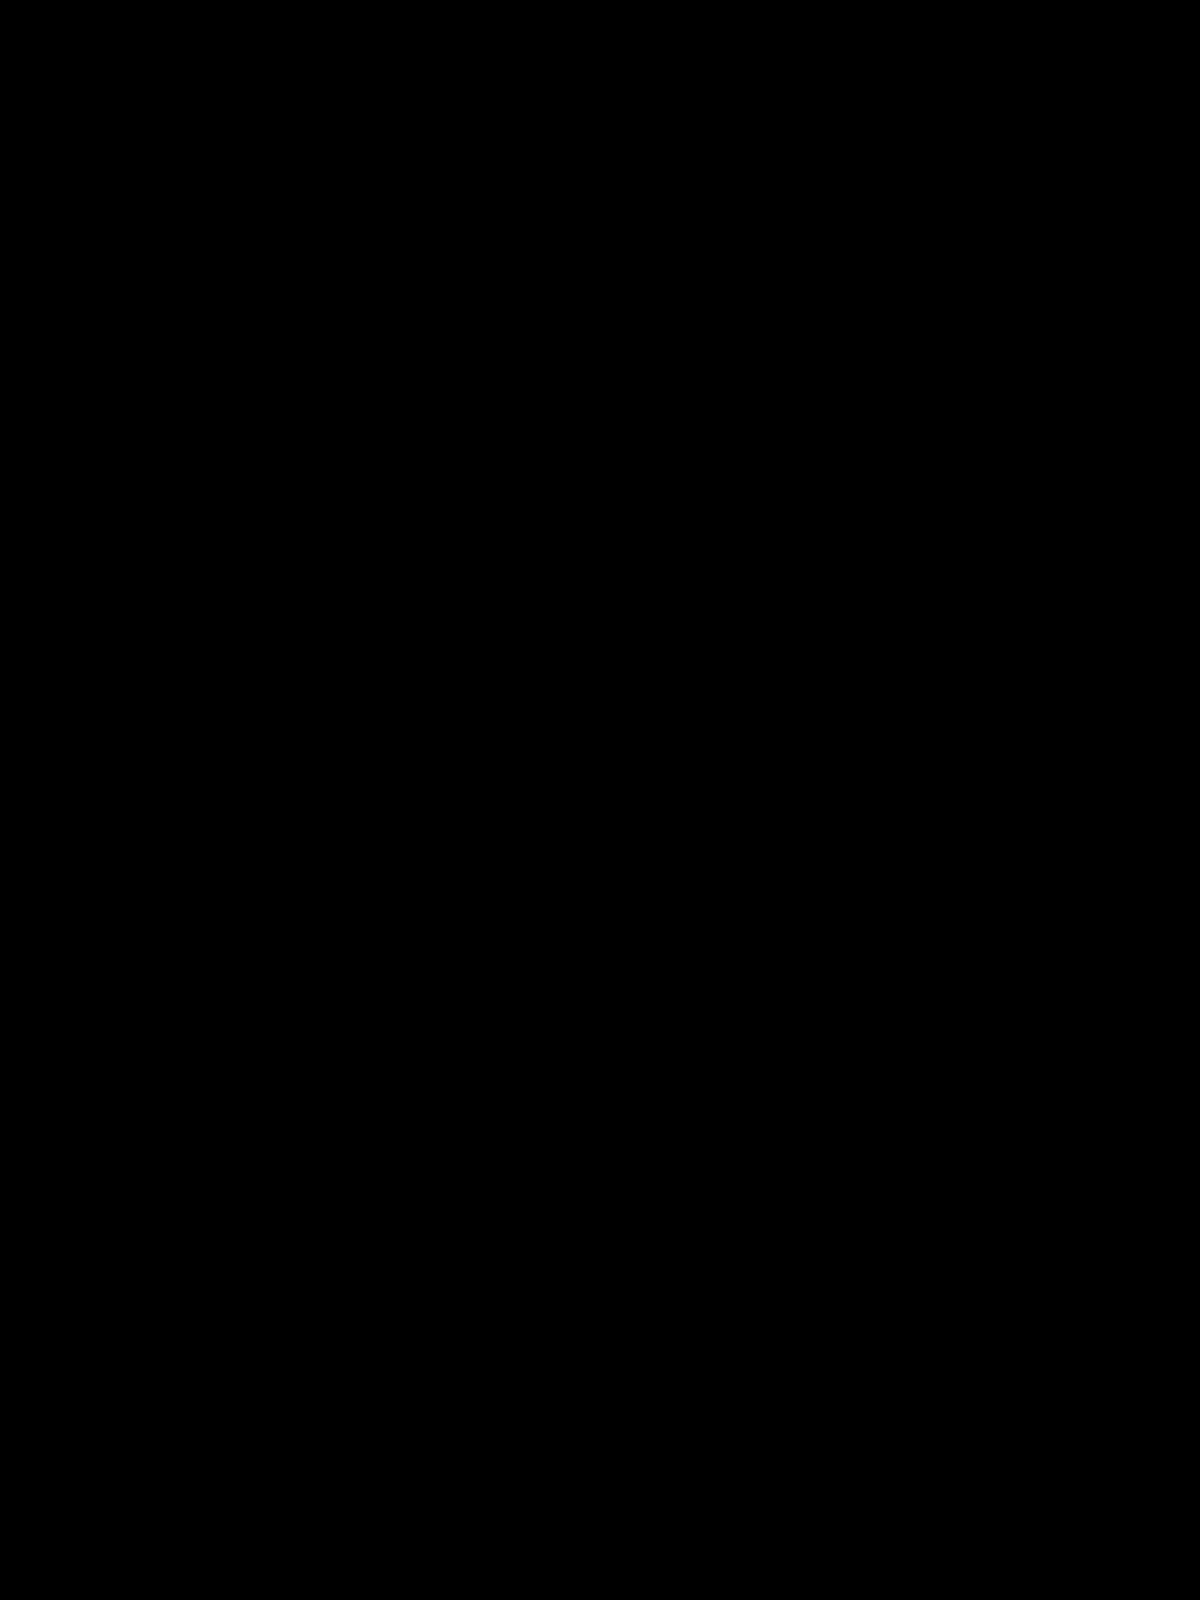 dimensional_lettering_shocktop